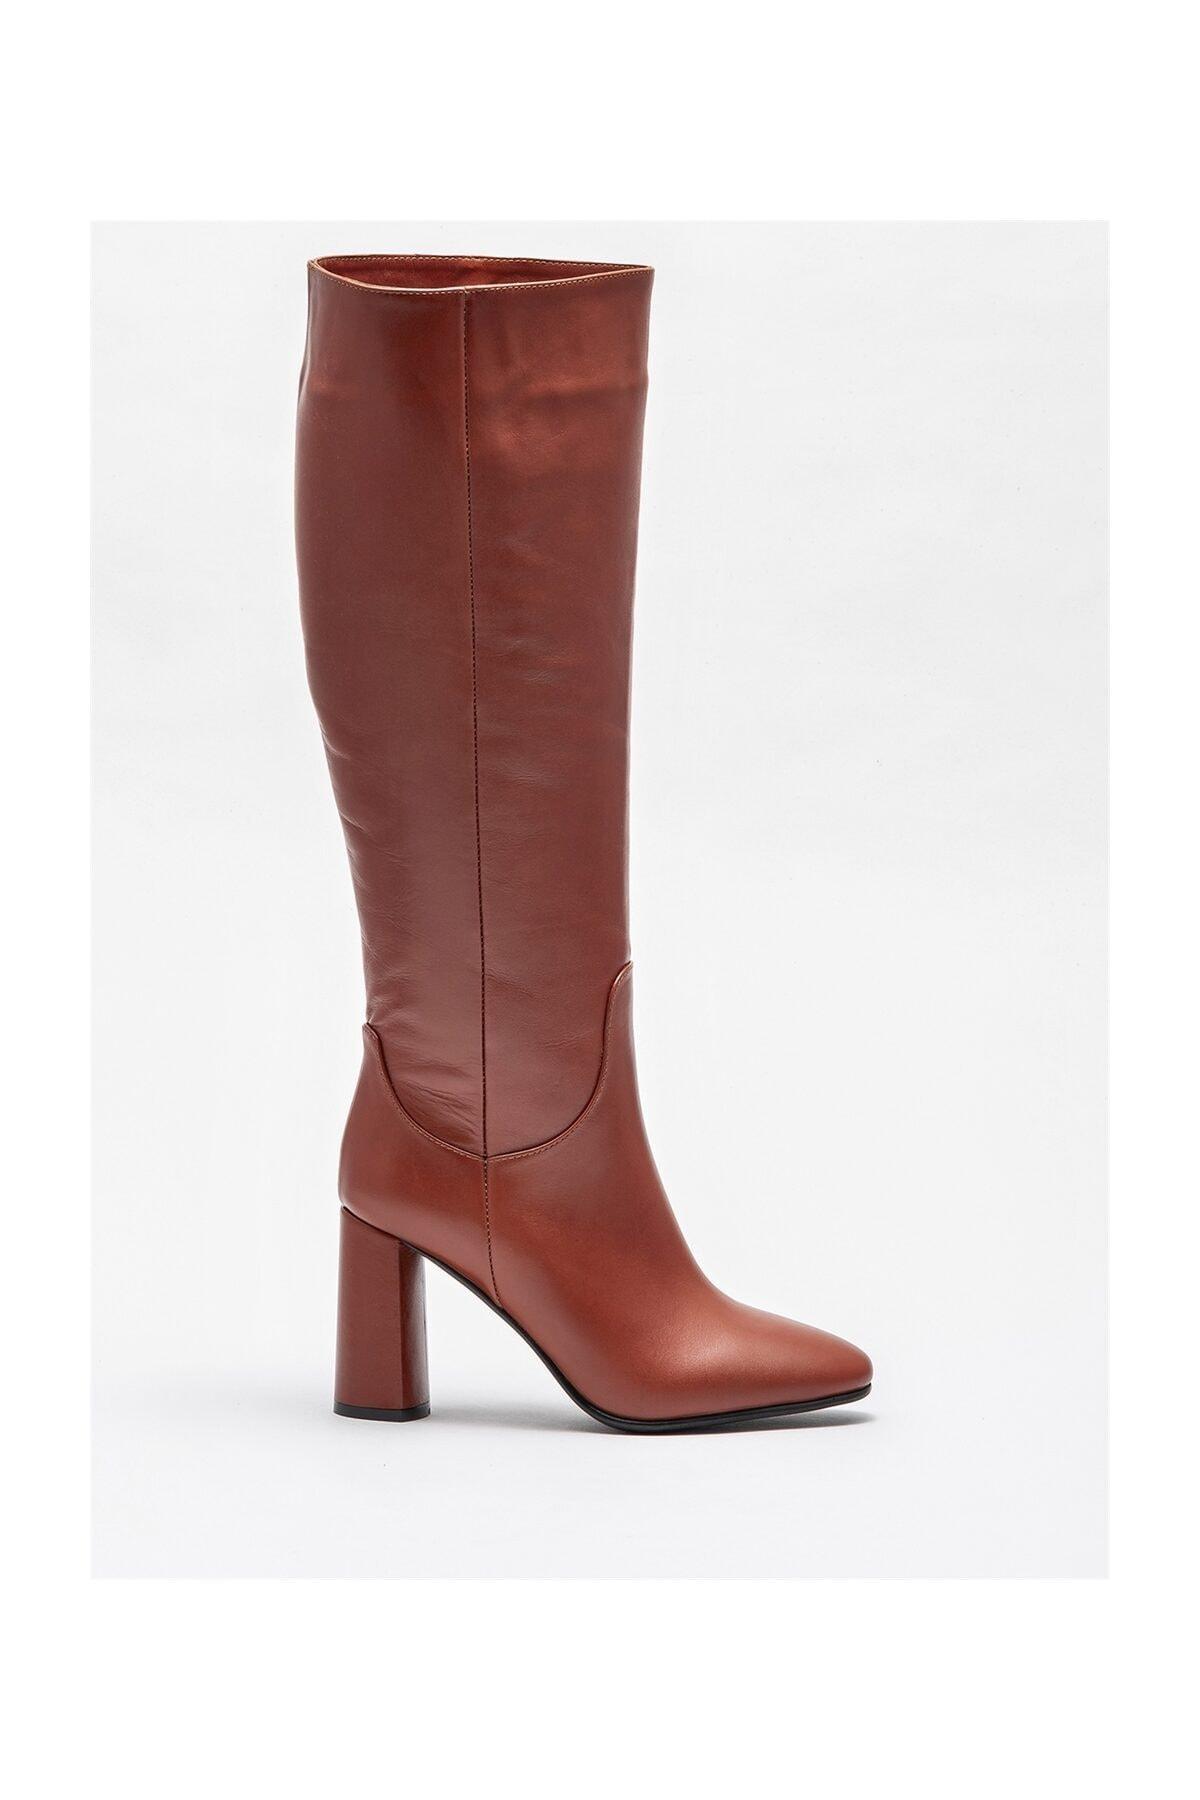 Elle Shoes Shoes Adrano-1 Kadın Çizme 20K052 1